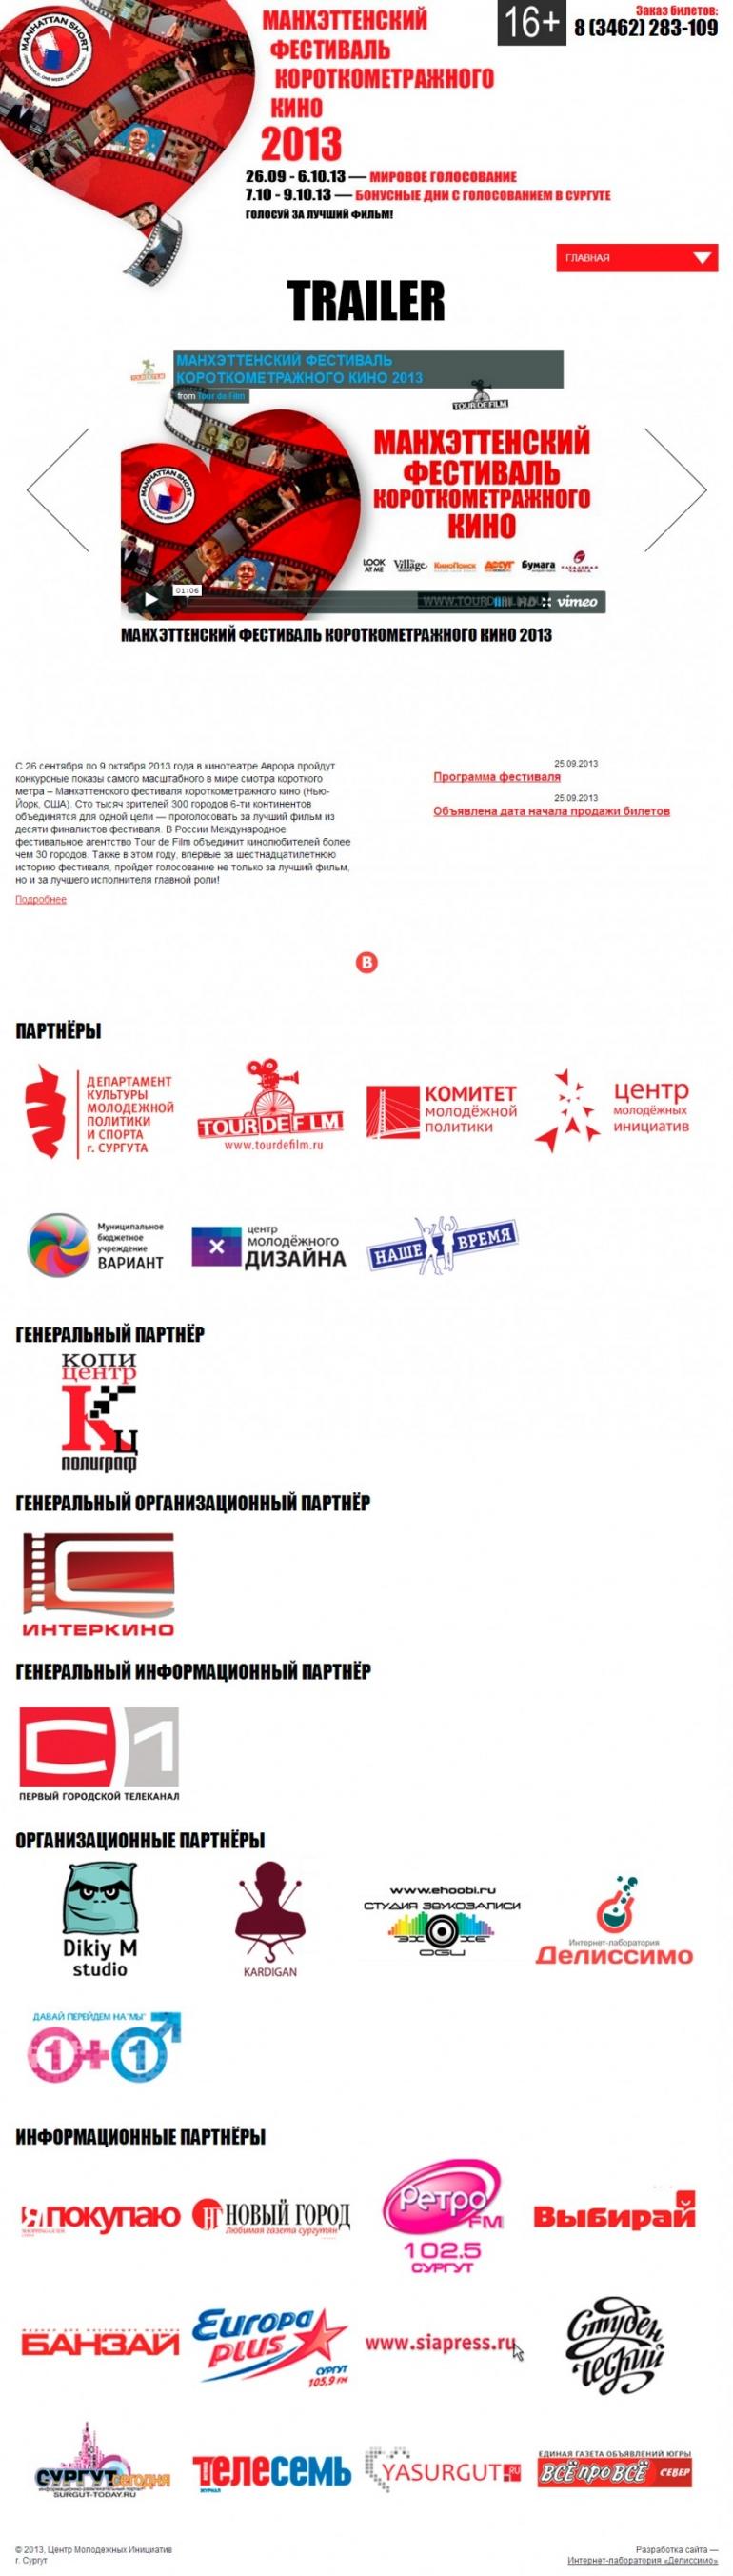 Главная страница mf86.ru